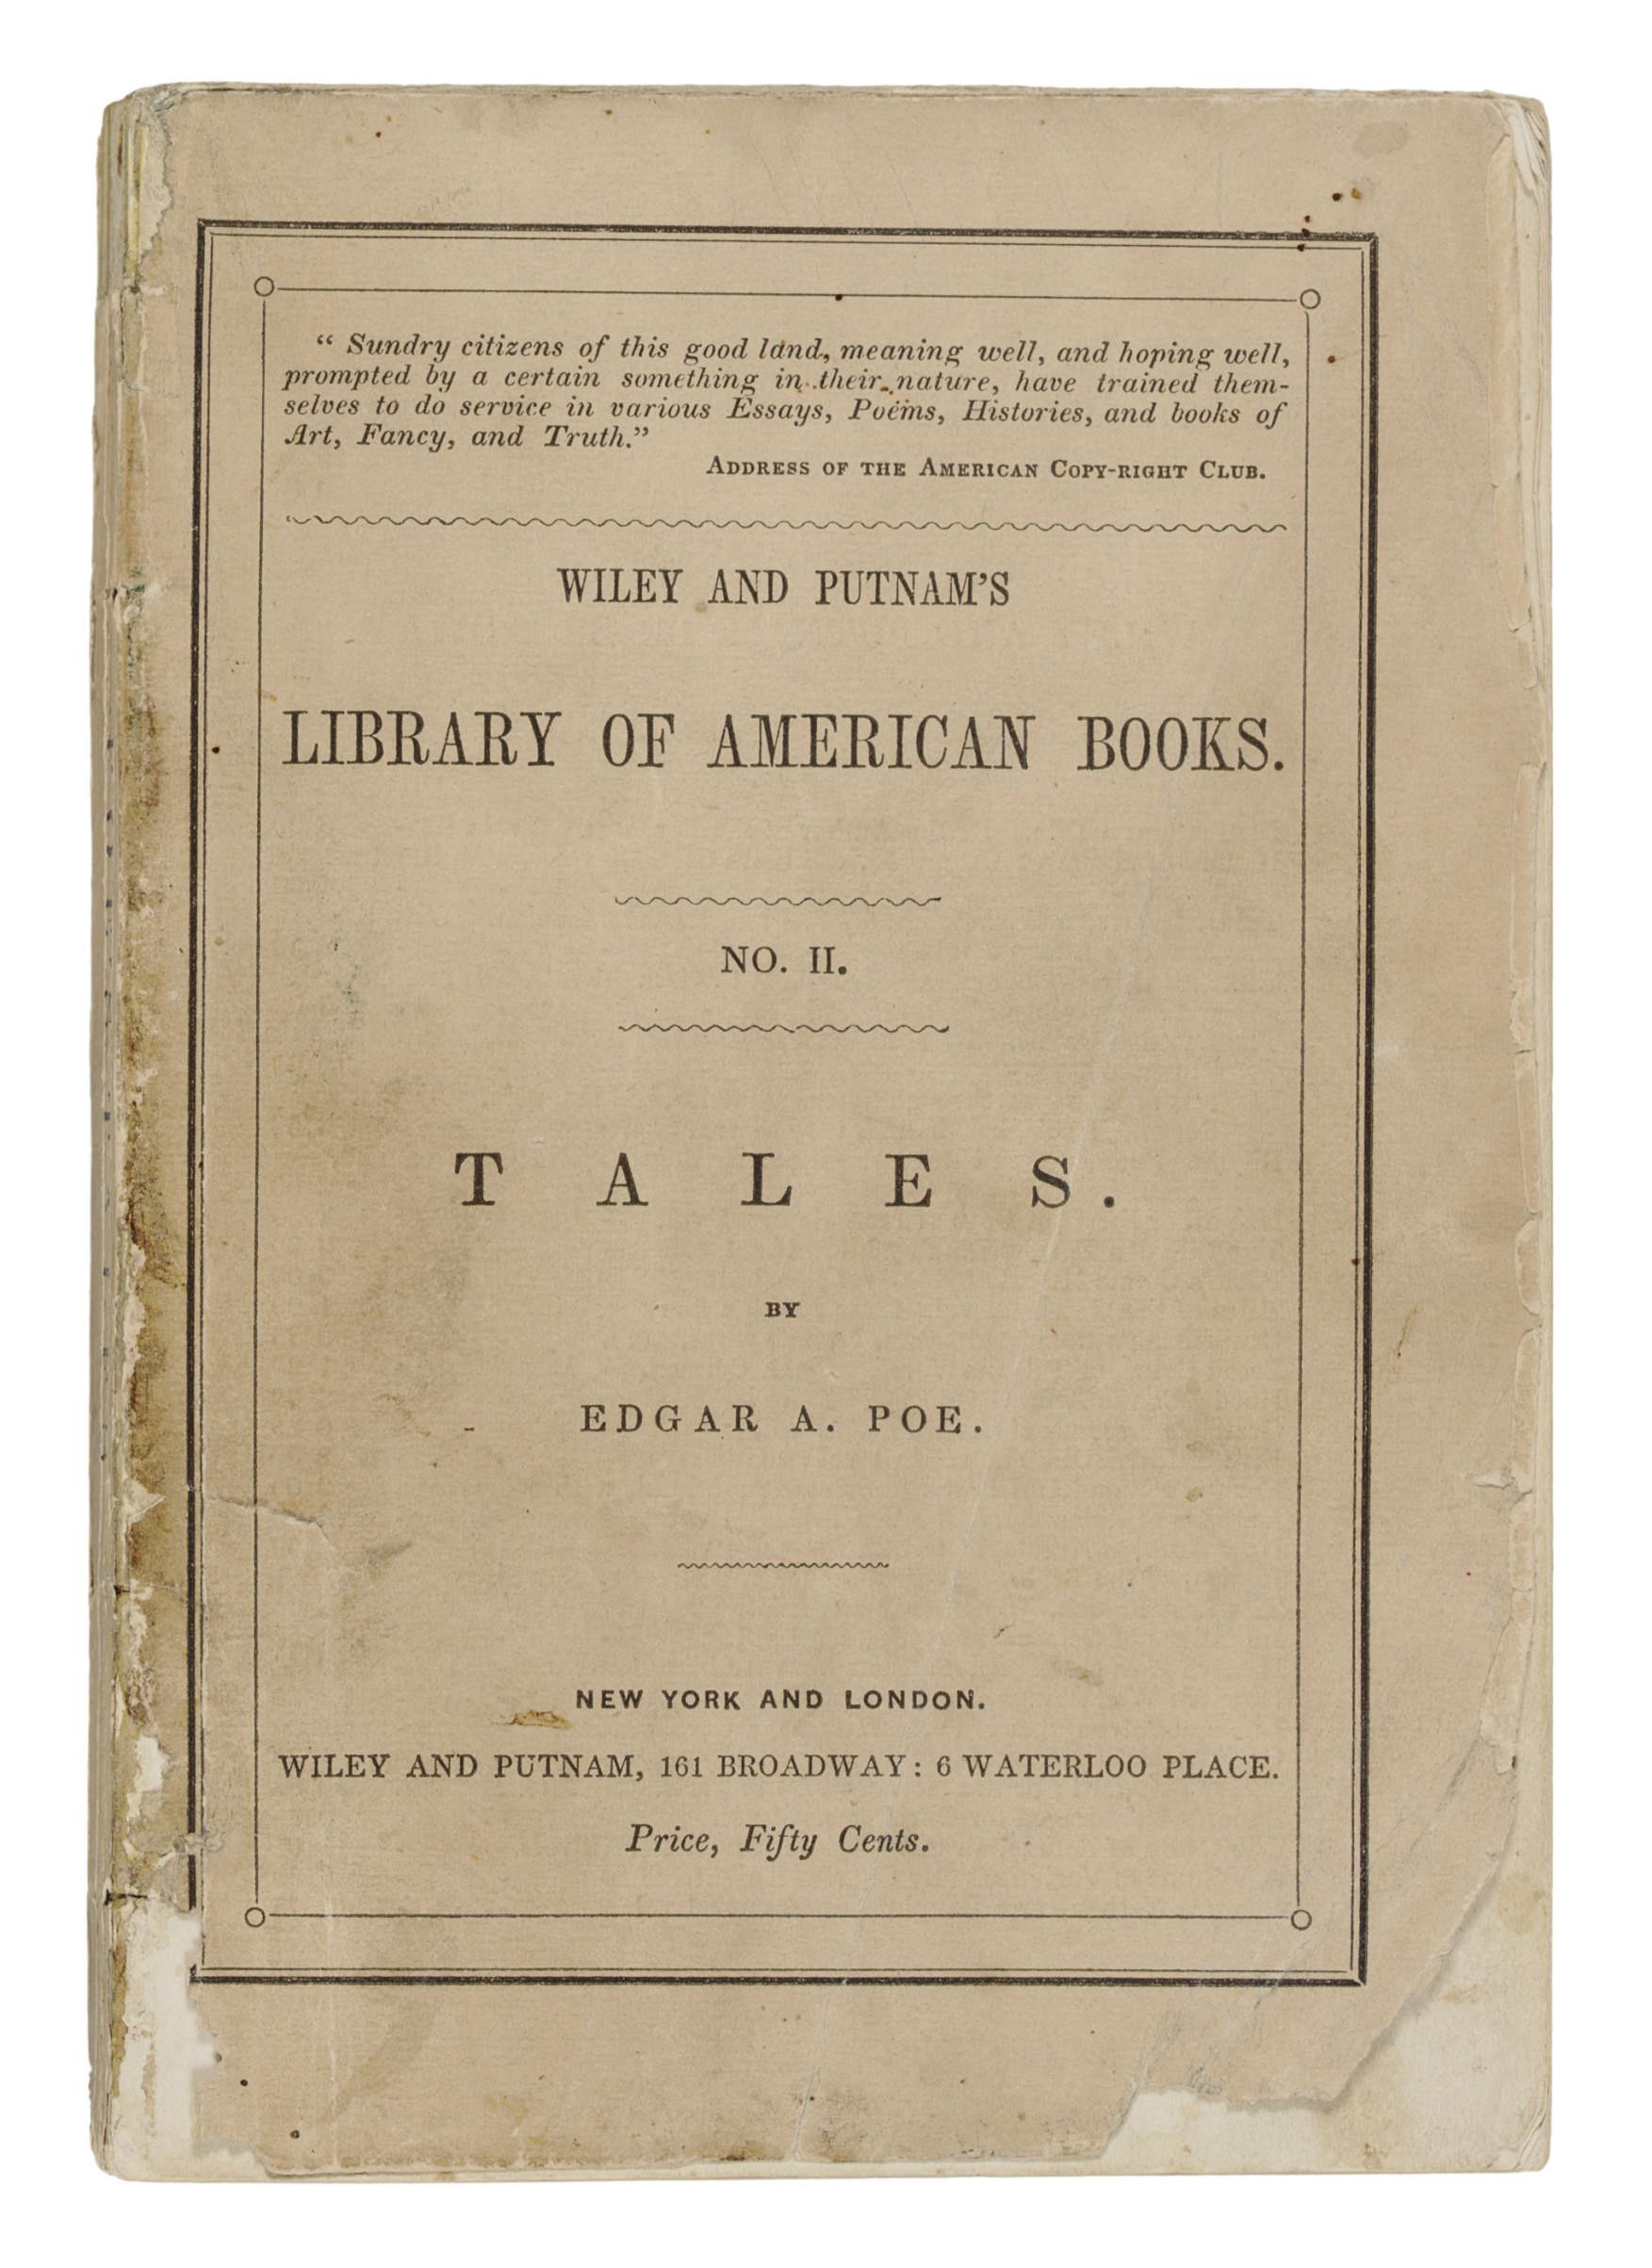 POE, Edgar Allan. Tales. New York: Wiley and Putnam, 1845